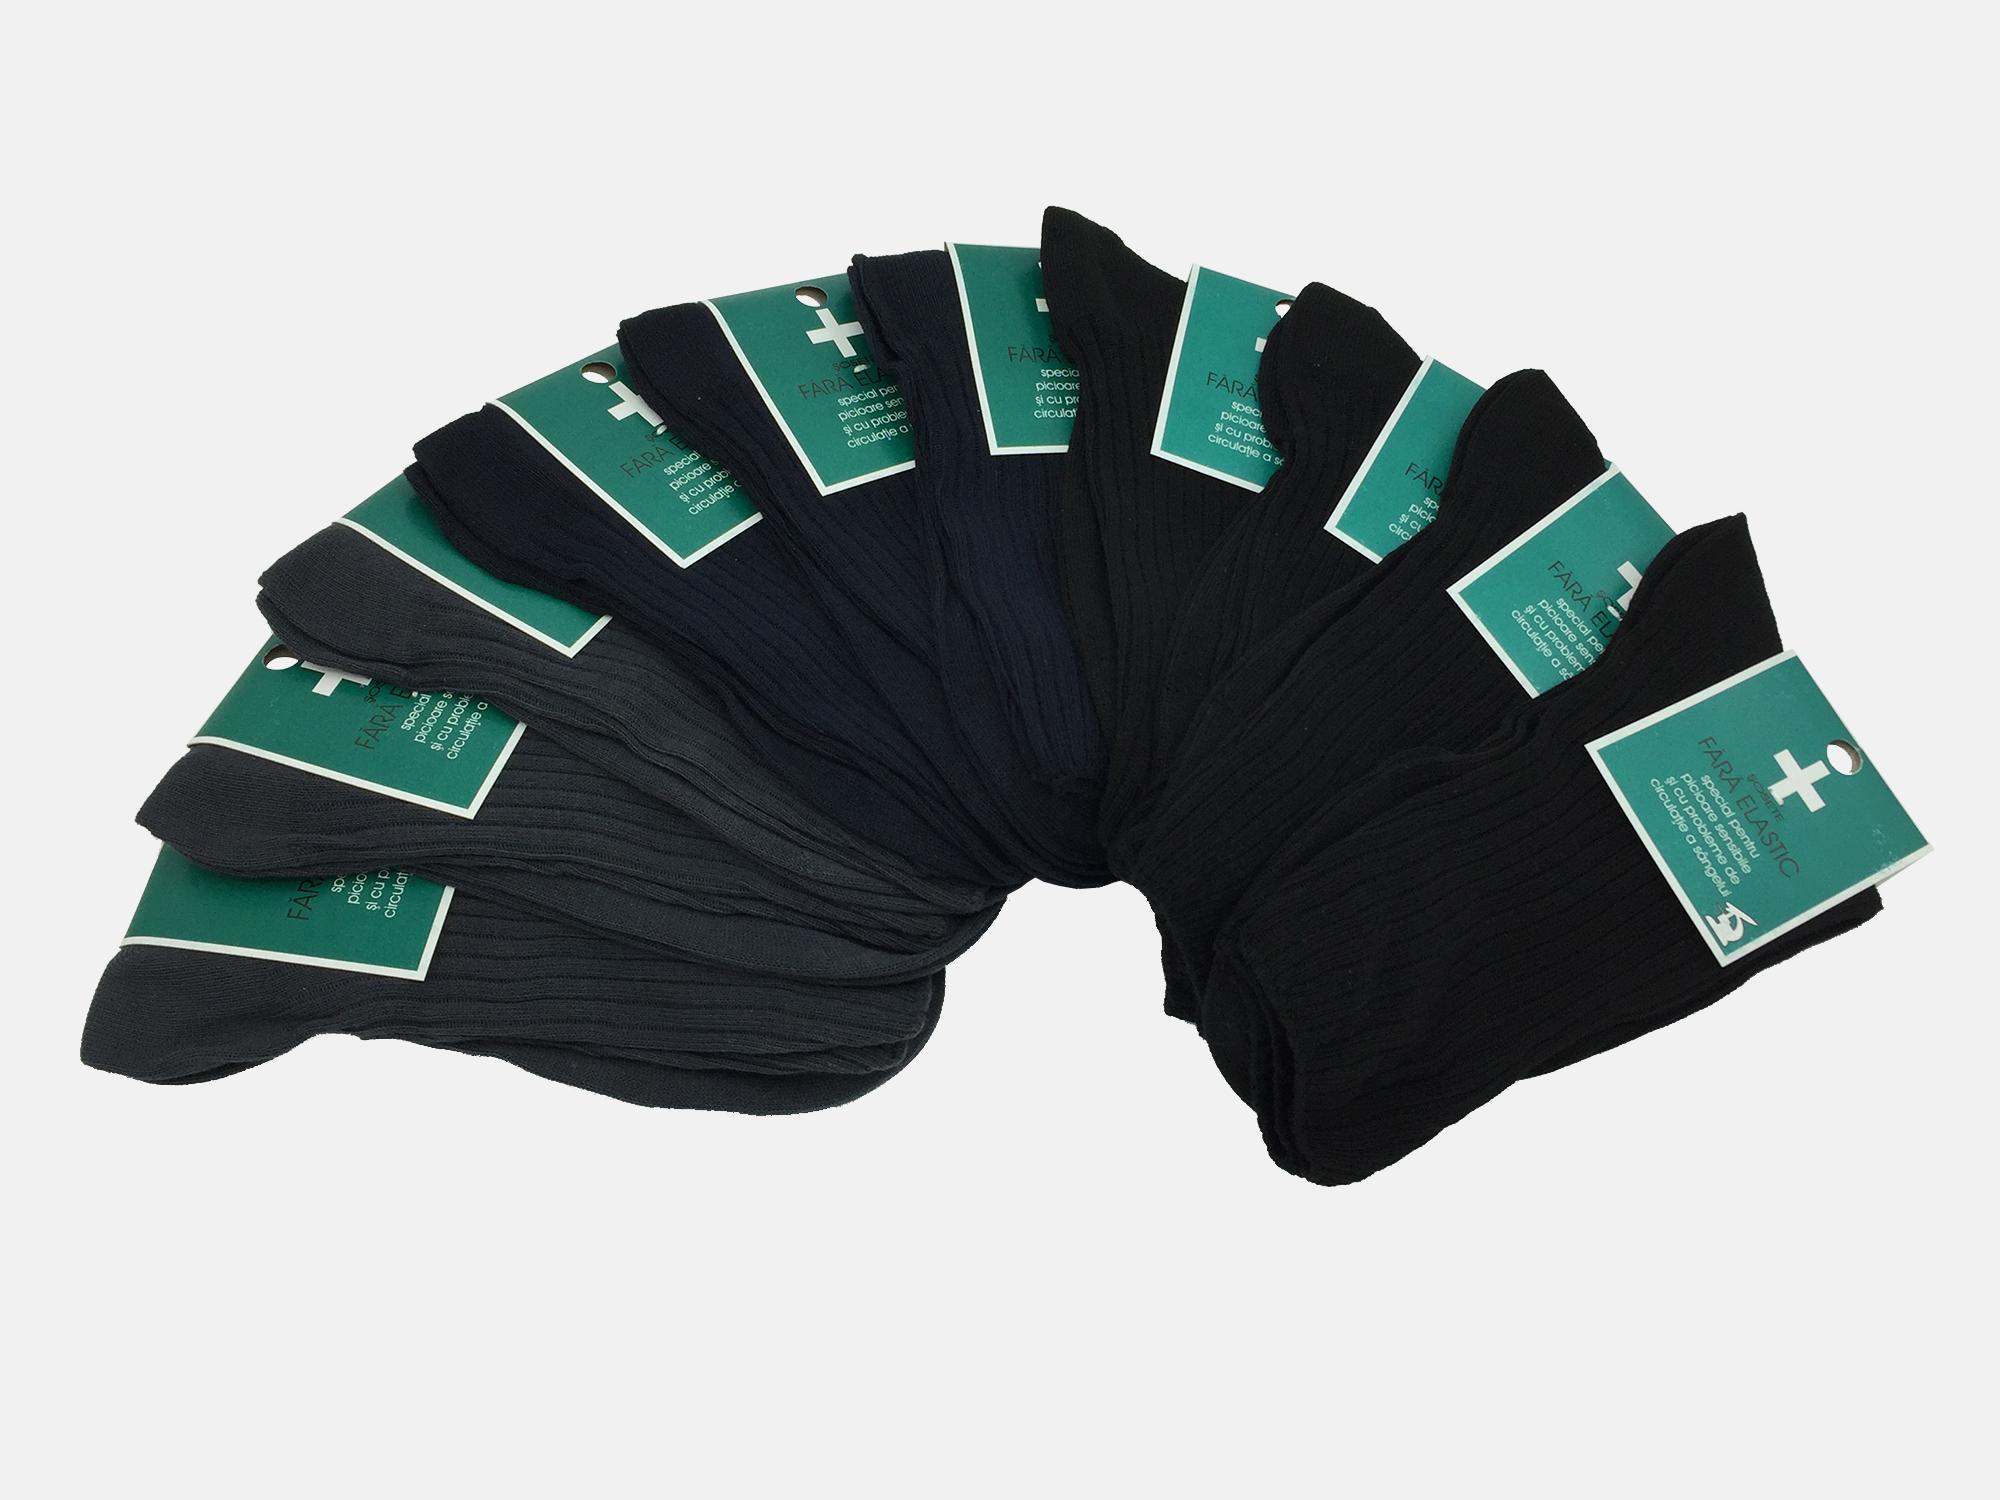 Sosete barbati medicinale 100% Bumbac - Multicolor - set 10 perechi - Ciserom 8456